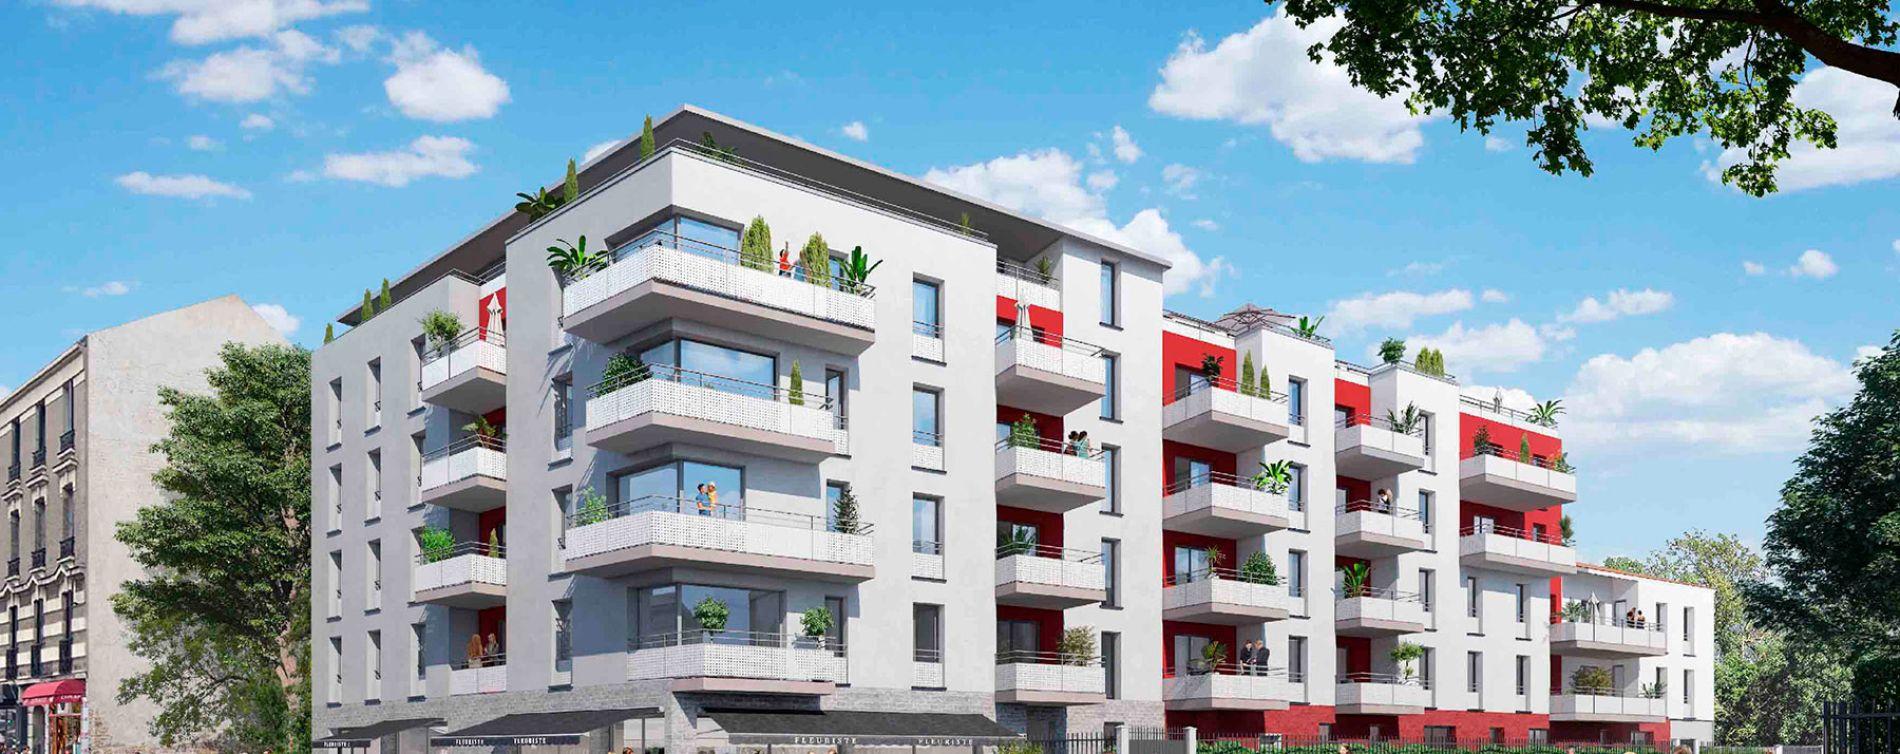 Neuilly-sur-Marne : programme immobilier neuve « Côté Jardin » (2)